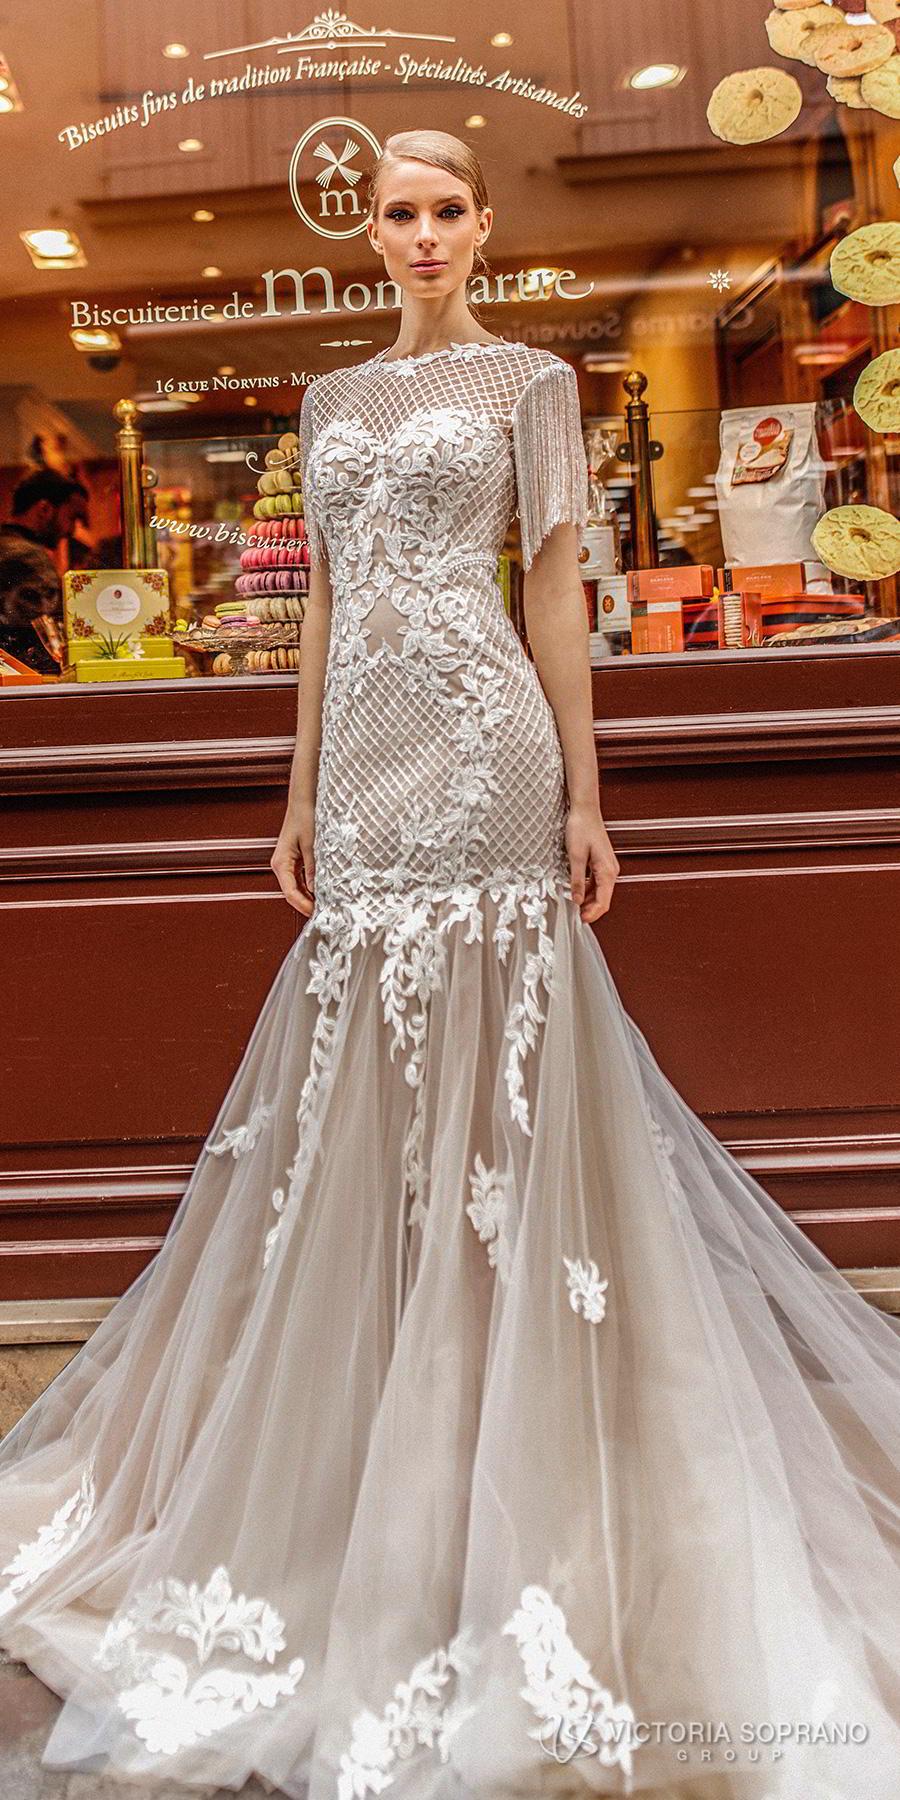 victoria soprano 2019 bridal half sleeves bateau neckline heavily embellished bodice elegant mermaid wedding dress open v back long train (jizel) lv